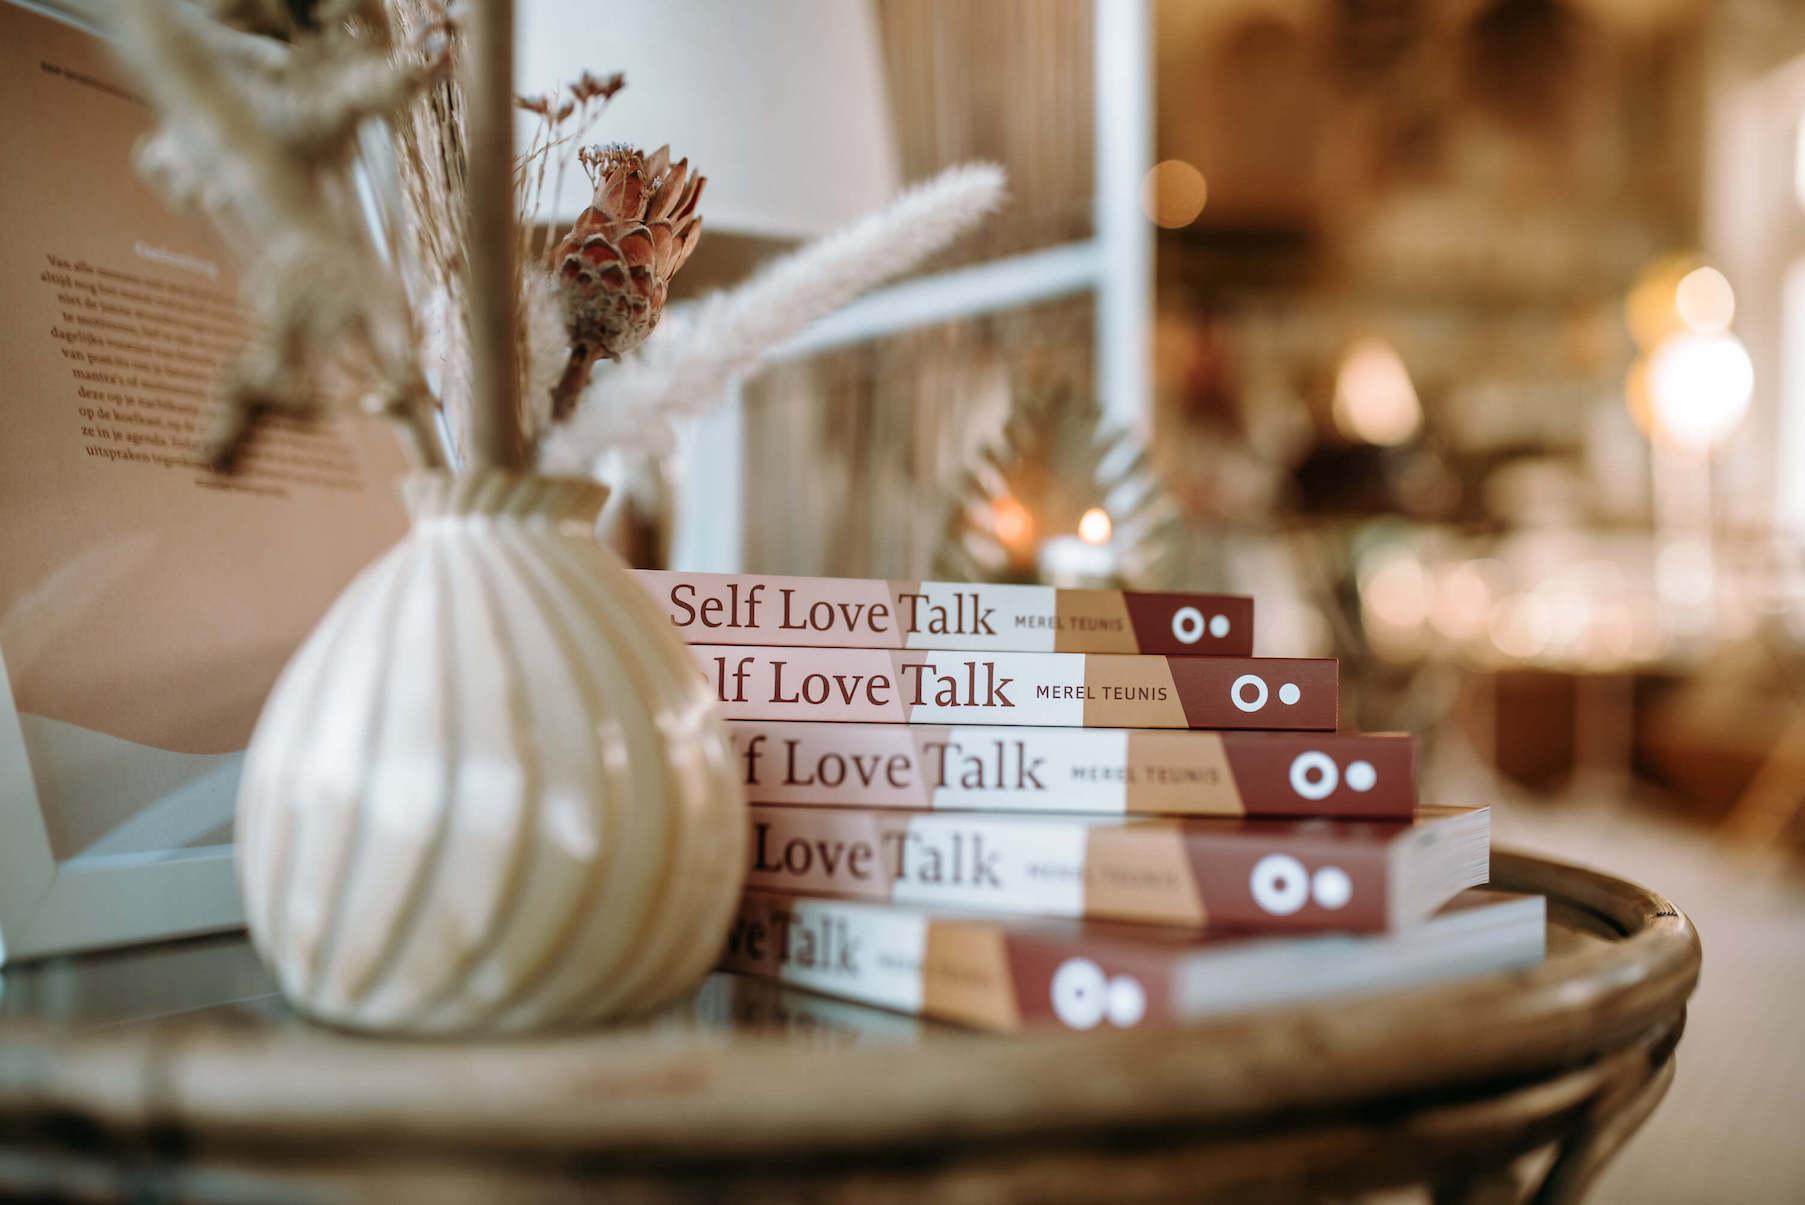 Terugblik op de boeklancering van Self Love Talk | Healthy Wanderlust